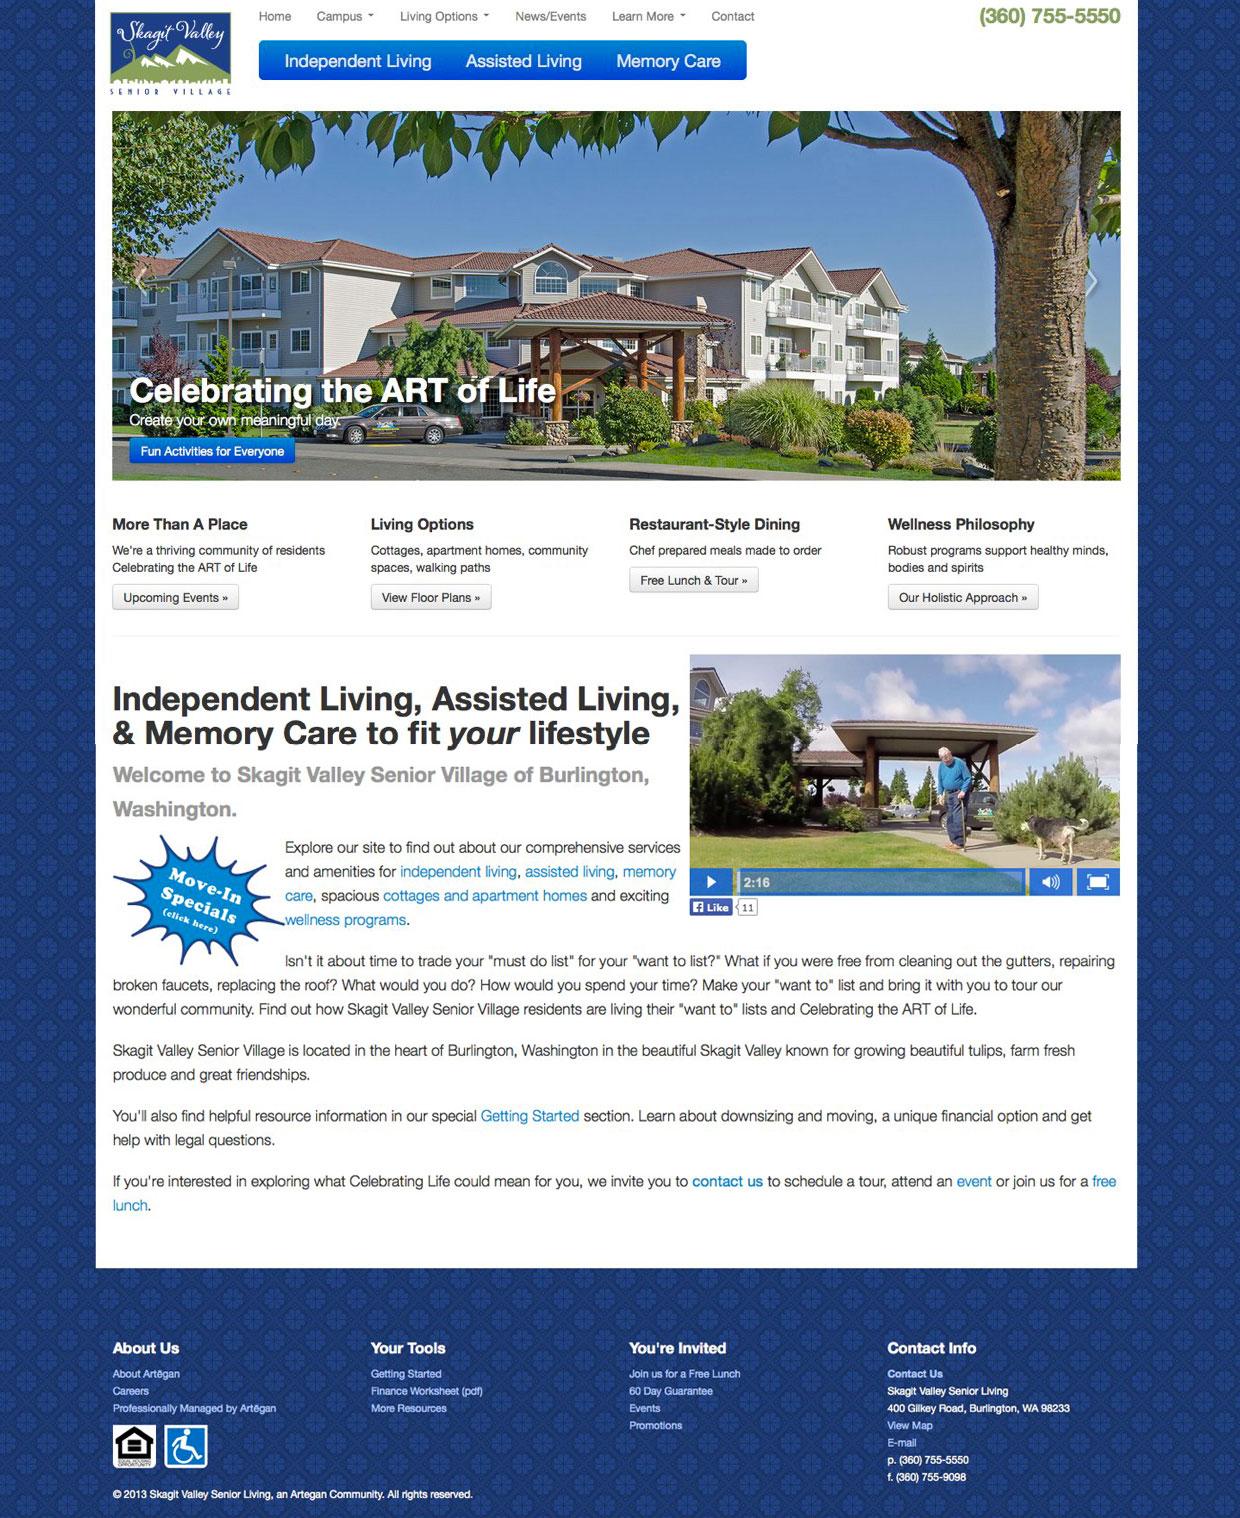 Website Design: Skagit Valley Senior Village